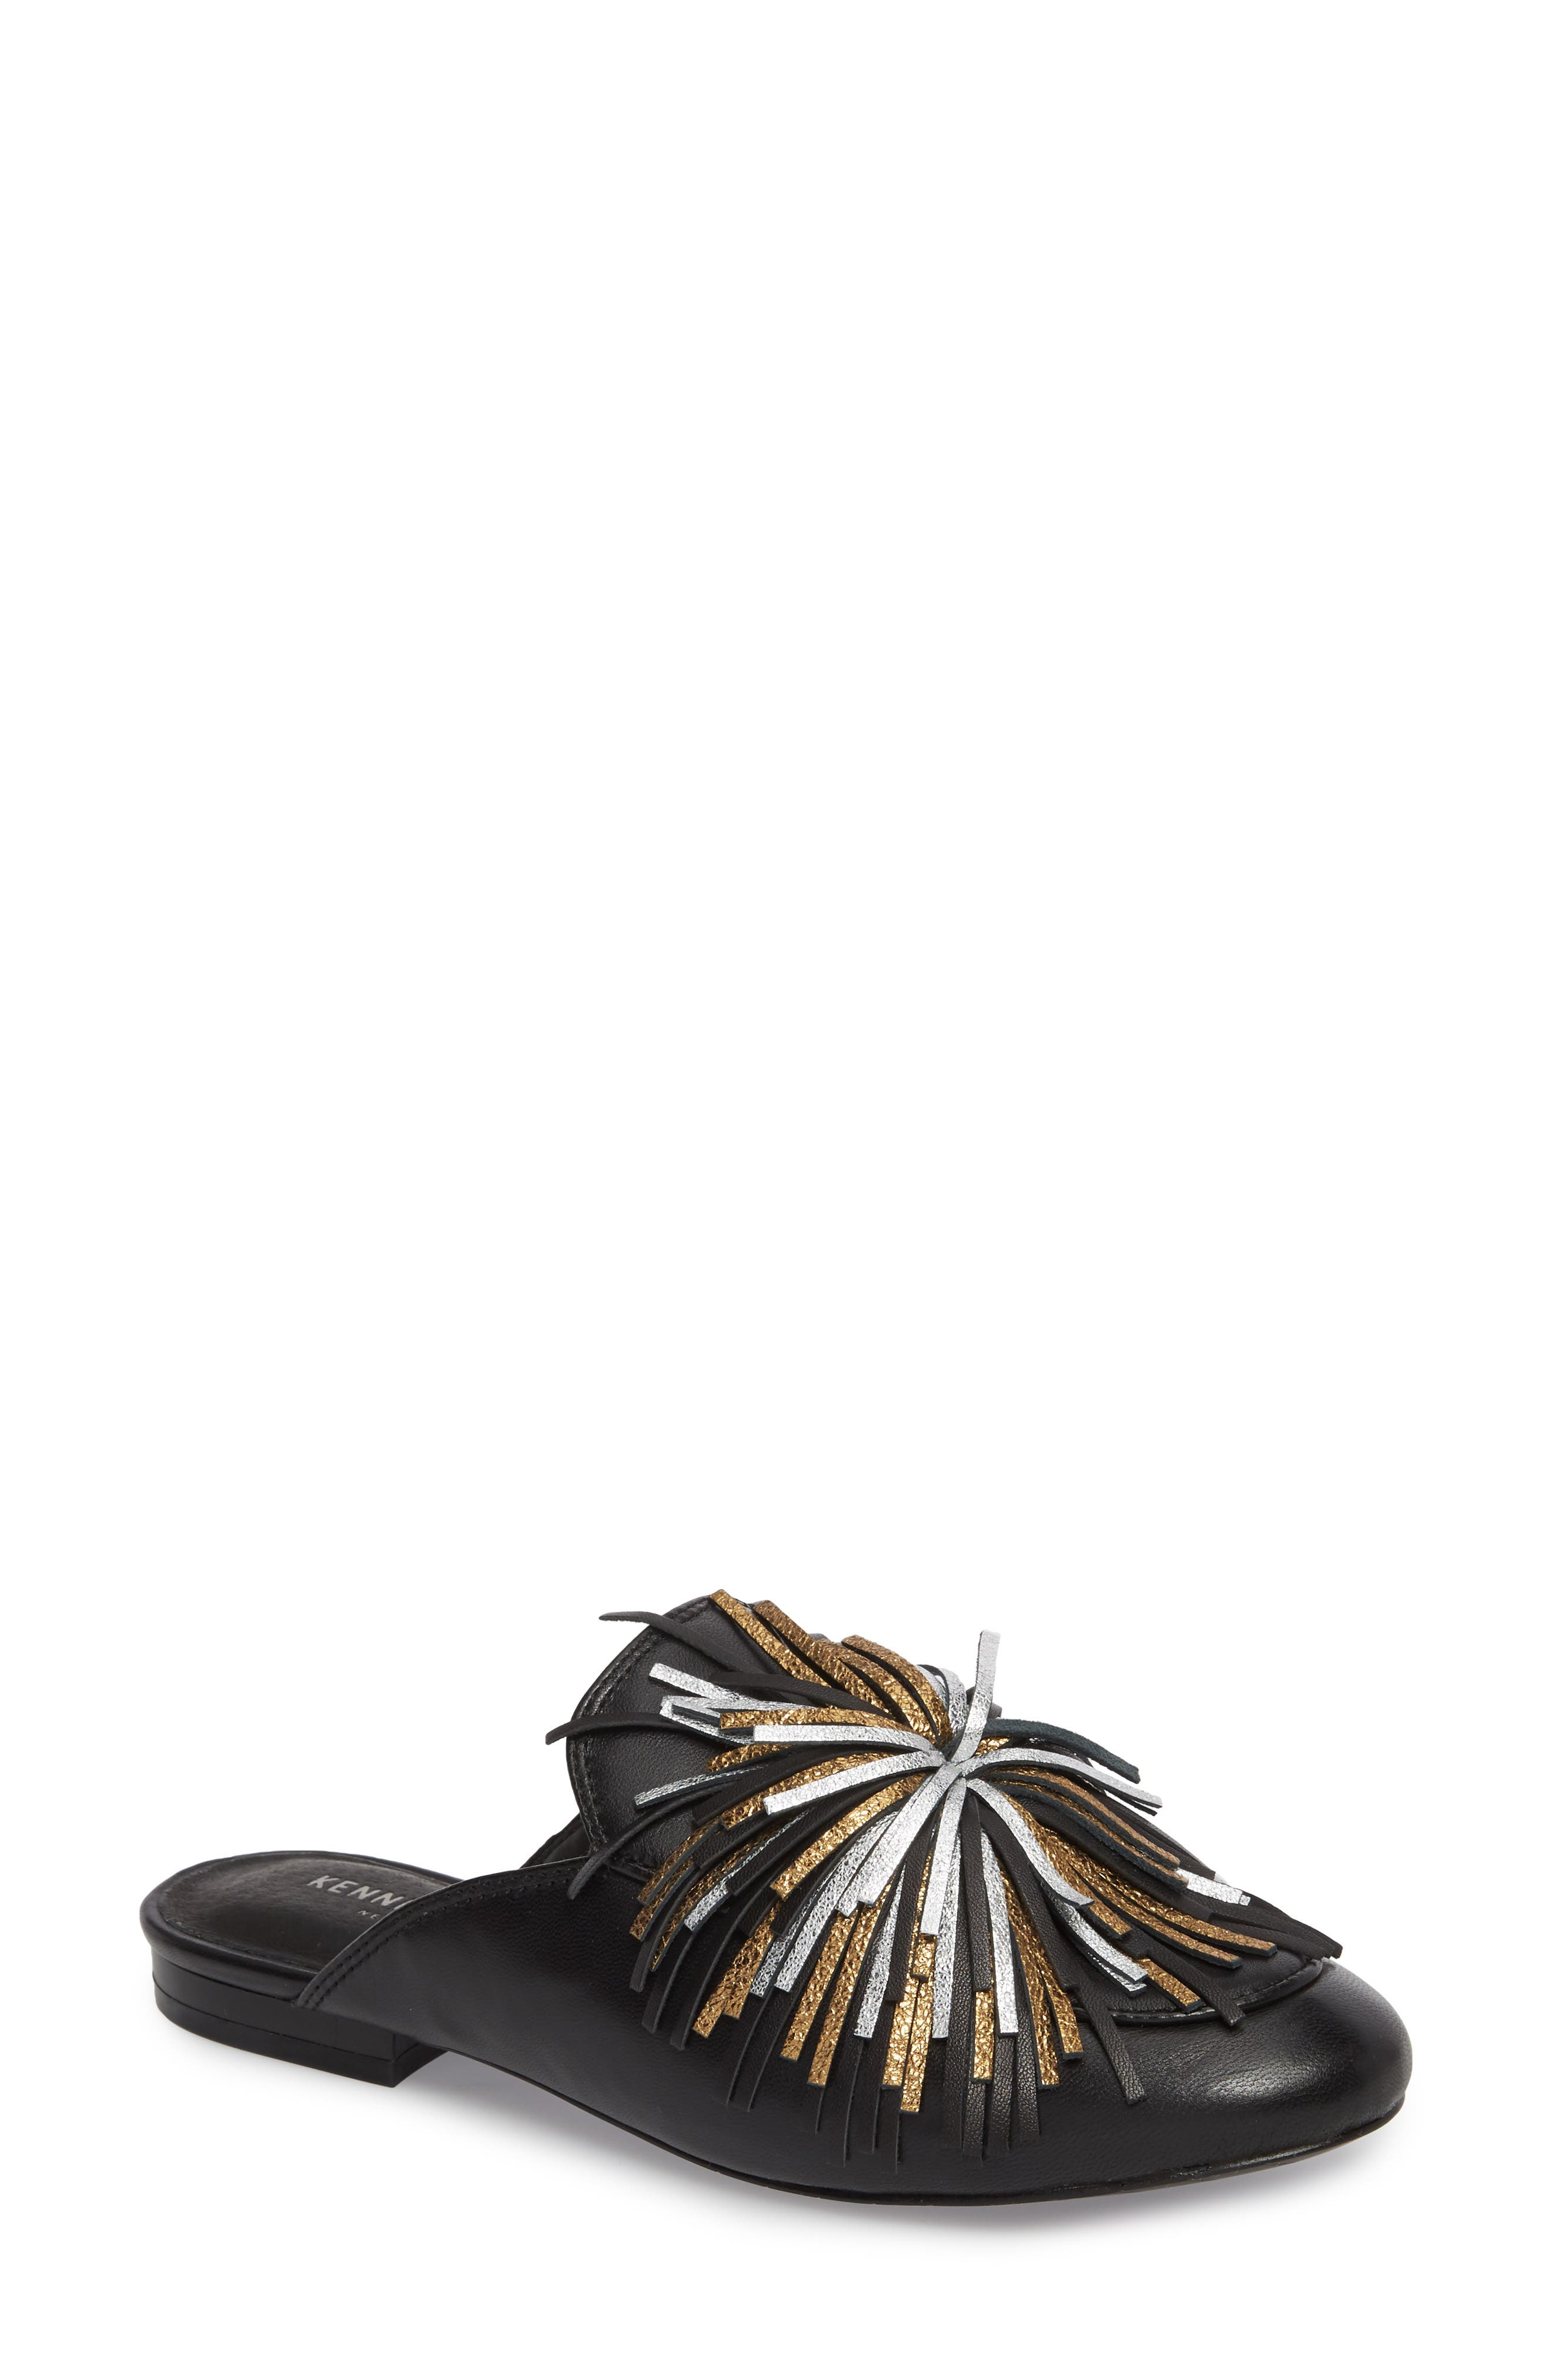 Wallice Firework Fringe Loafer Mule,                             Main thumbnail 1, color,                             009